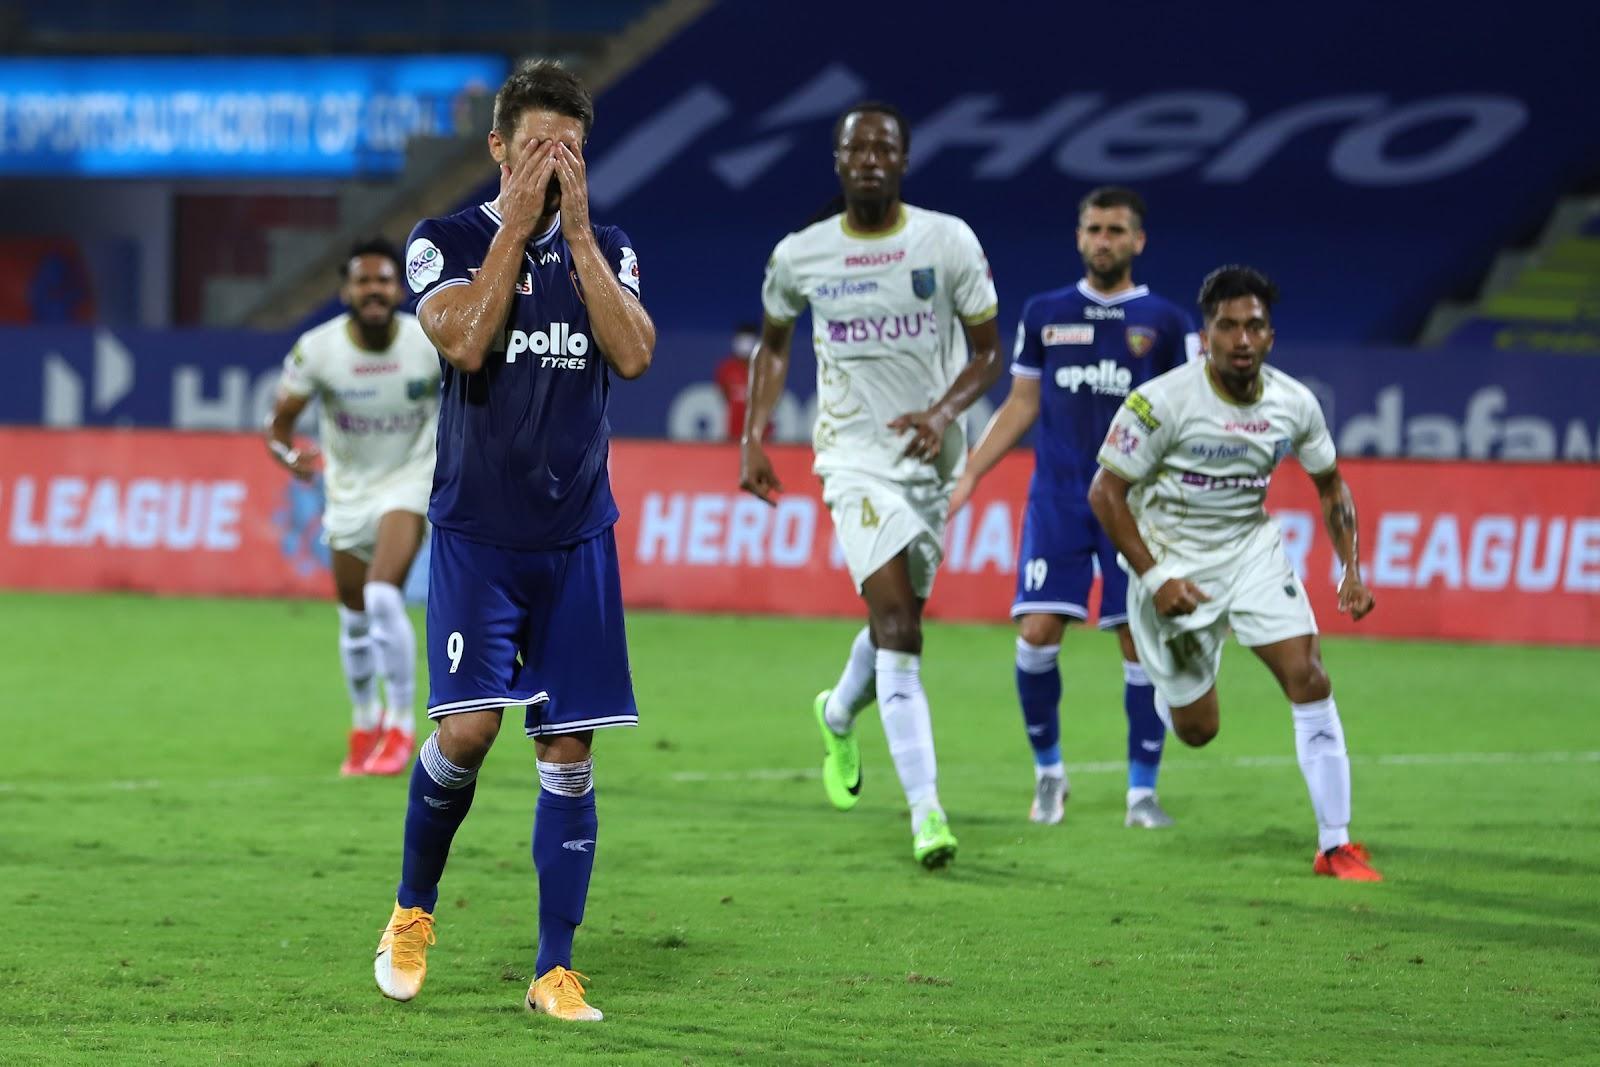 Jakub Sylvester missing a penalty against Kerala Blasters FC (Image Credit: Indian Super League)